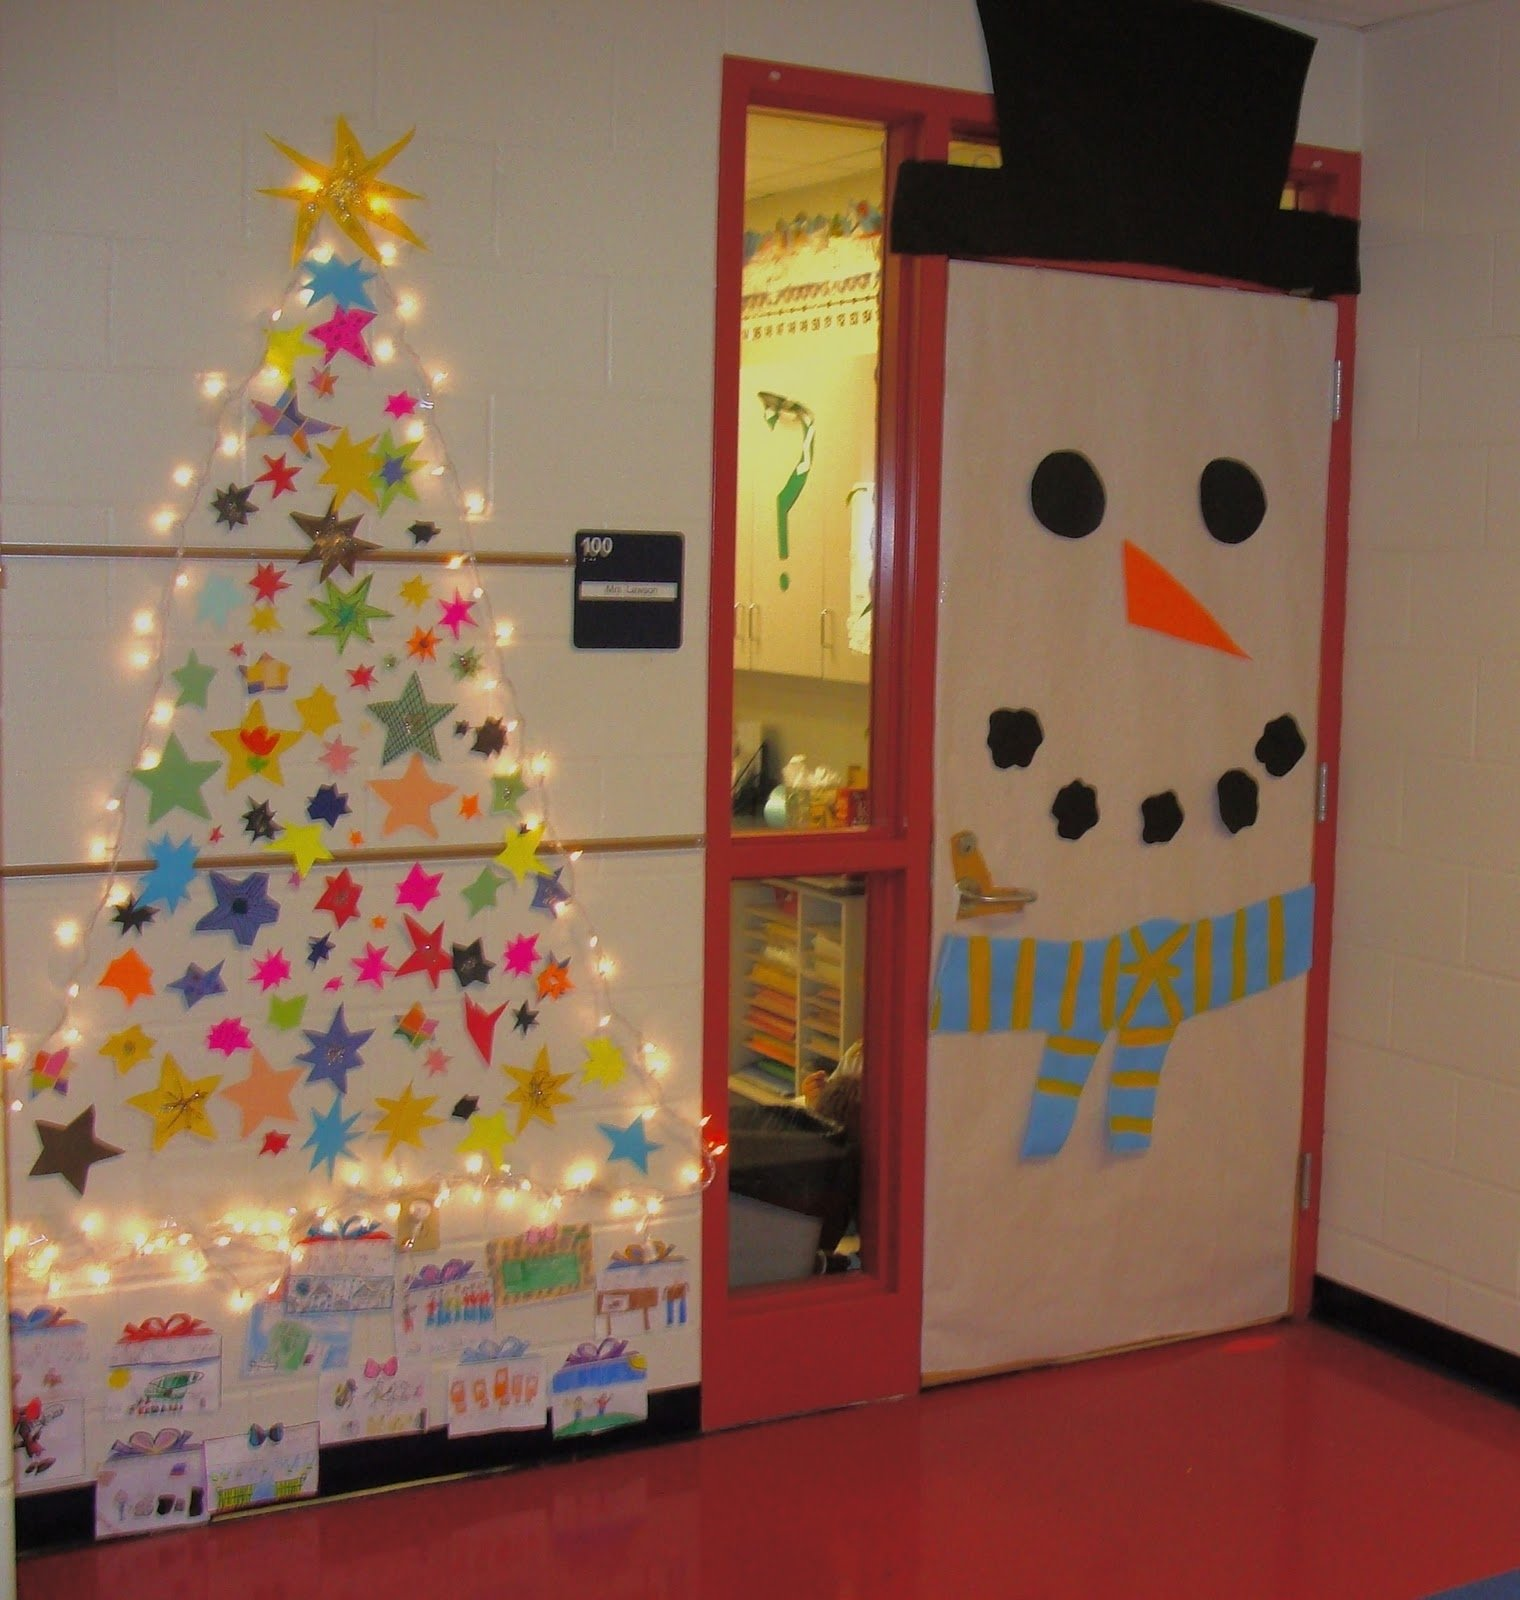 10 Great Classroom Christmas Door Decorating Ideas classroom christmas door decorating ideas classroom decorating 2020